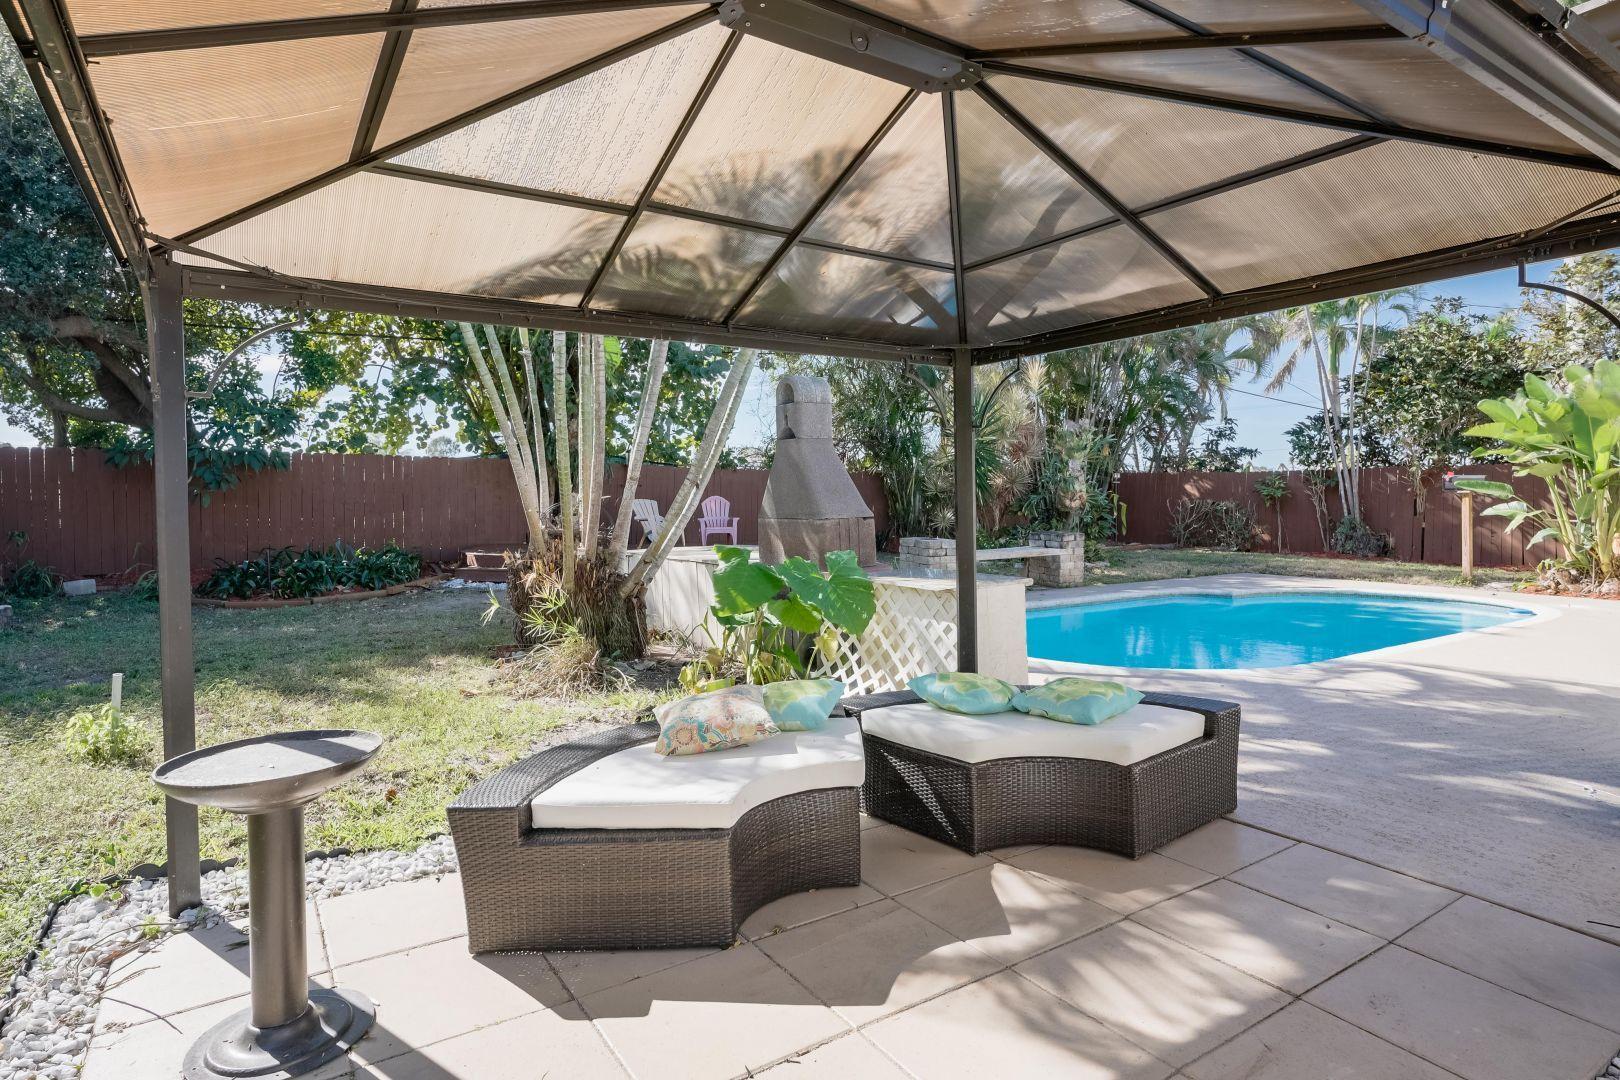 973 Laurel Road, North Palm Beach, Florida 33408, 4 Bedrooms Bedrooms, ,2 BathroomsBathrooms,Rental,For Rent,Laurel,RX-10611623